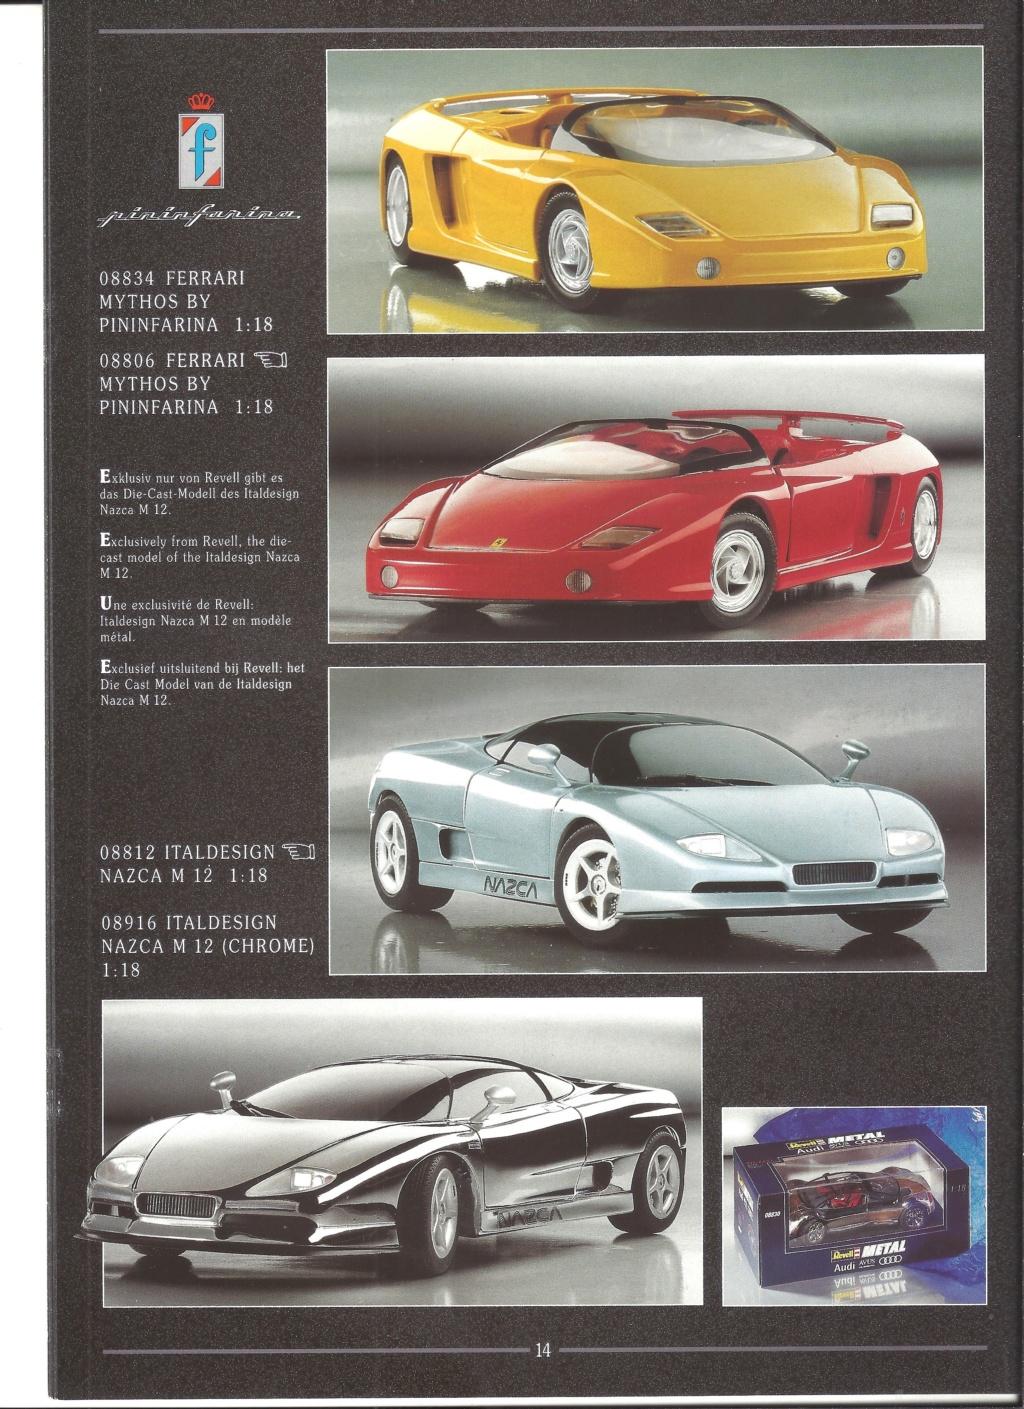 [REVELL 1995] Catalogue METAL miniatures 1995  Revell46